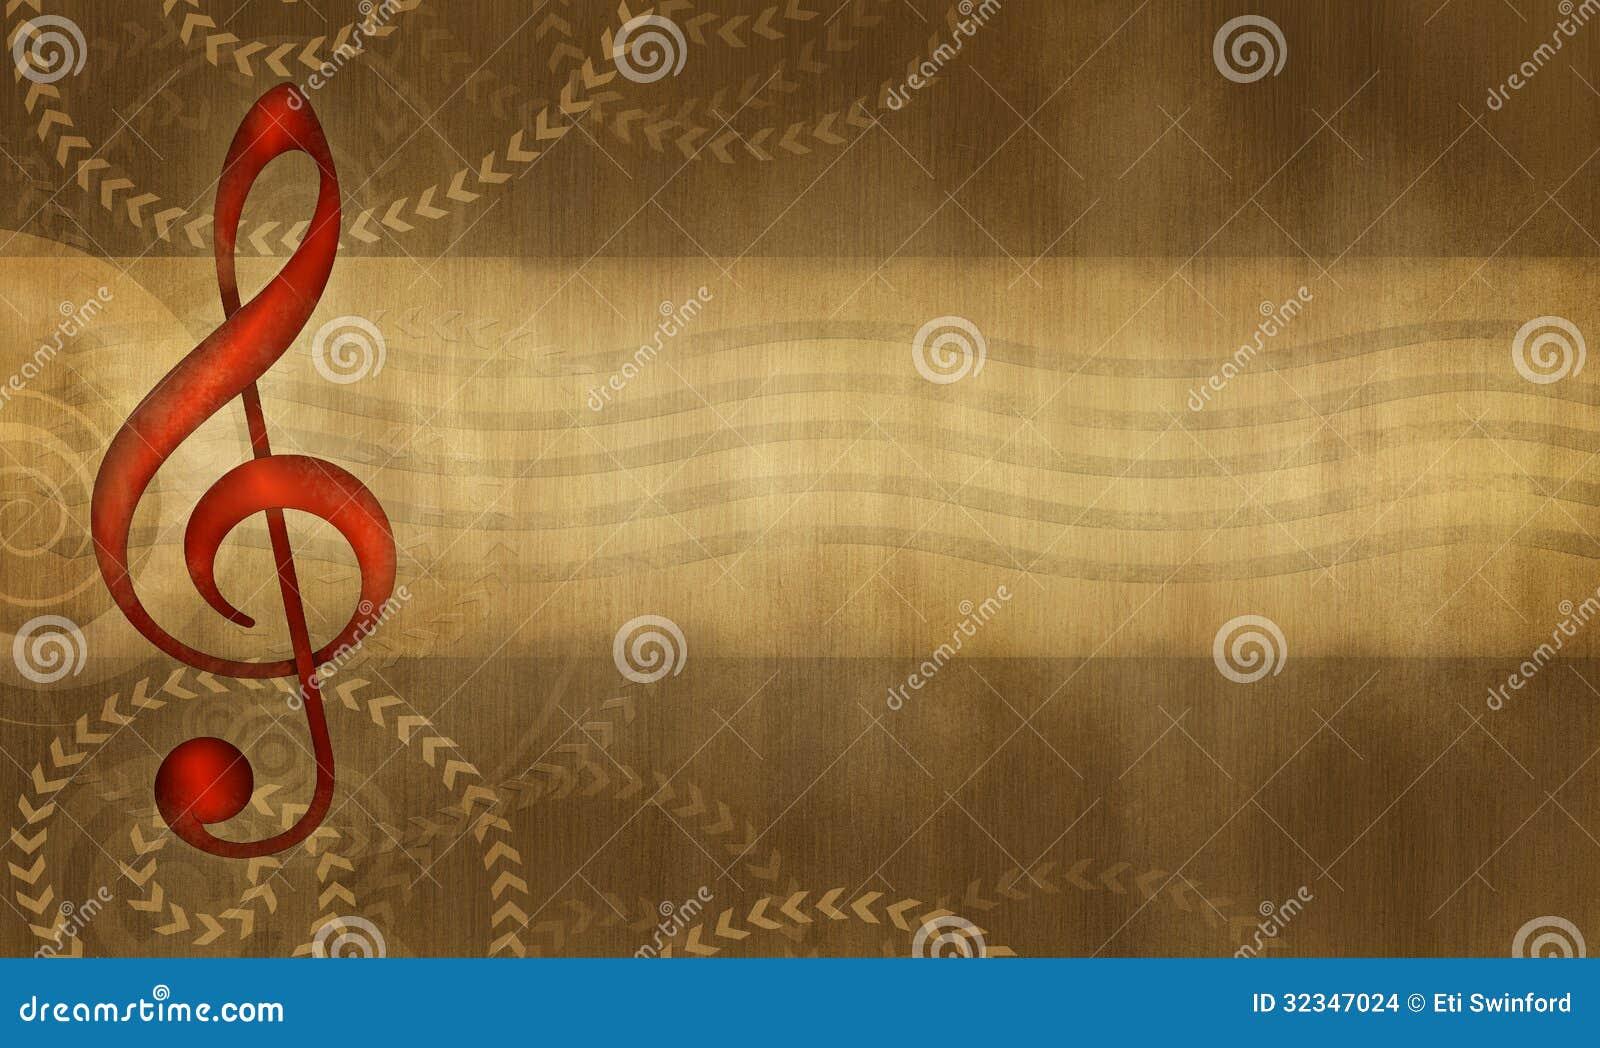 music symbol stock images image 32347024